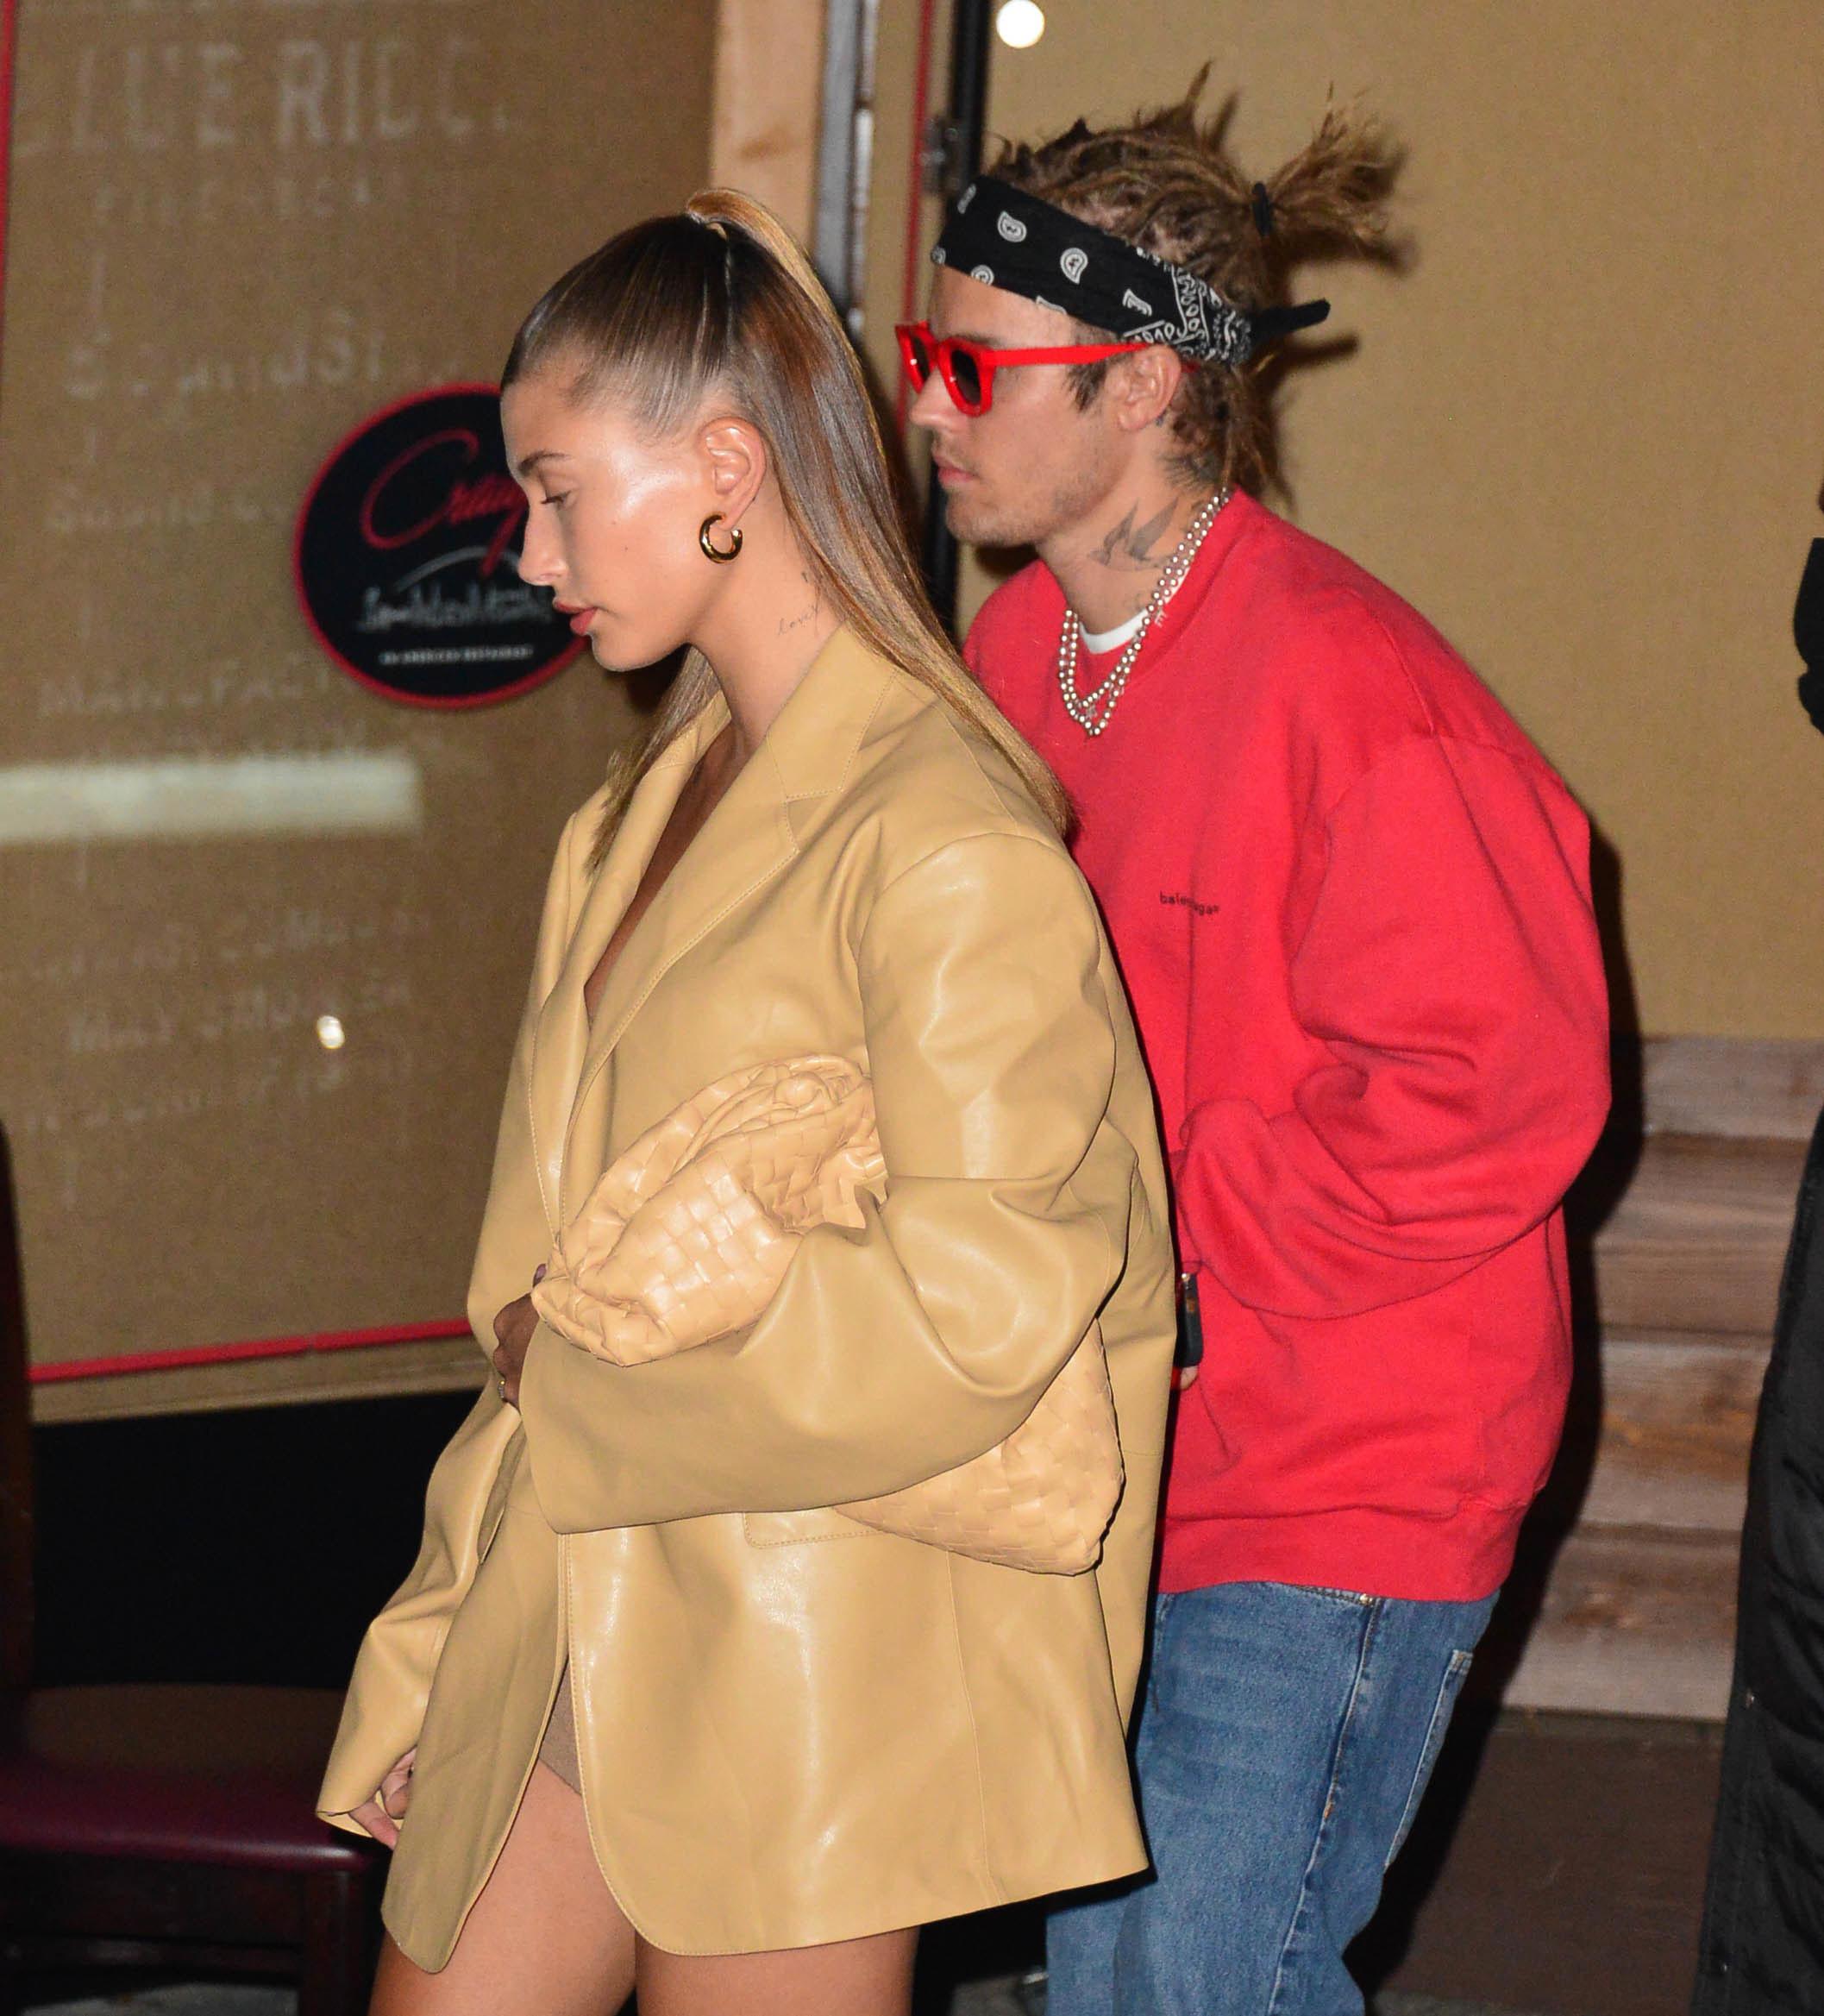 Hailey and Justin walking and not looking at the camera